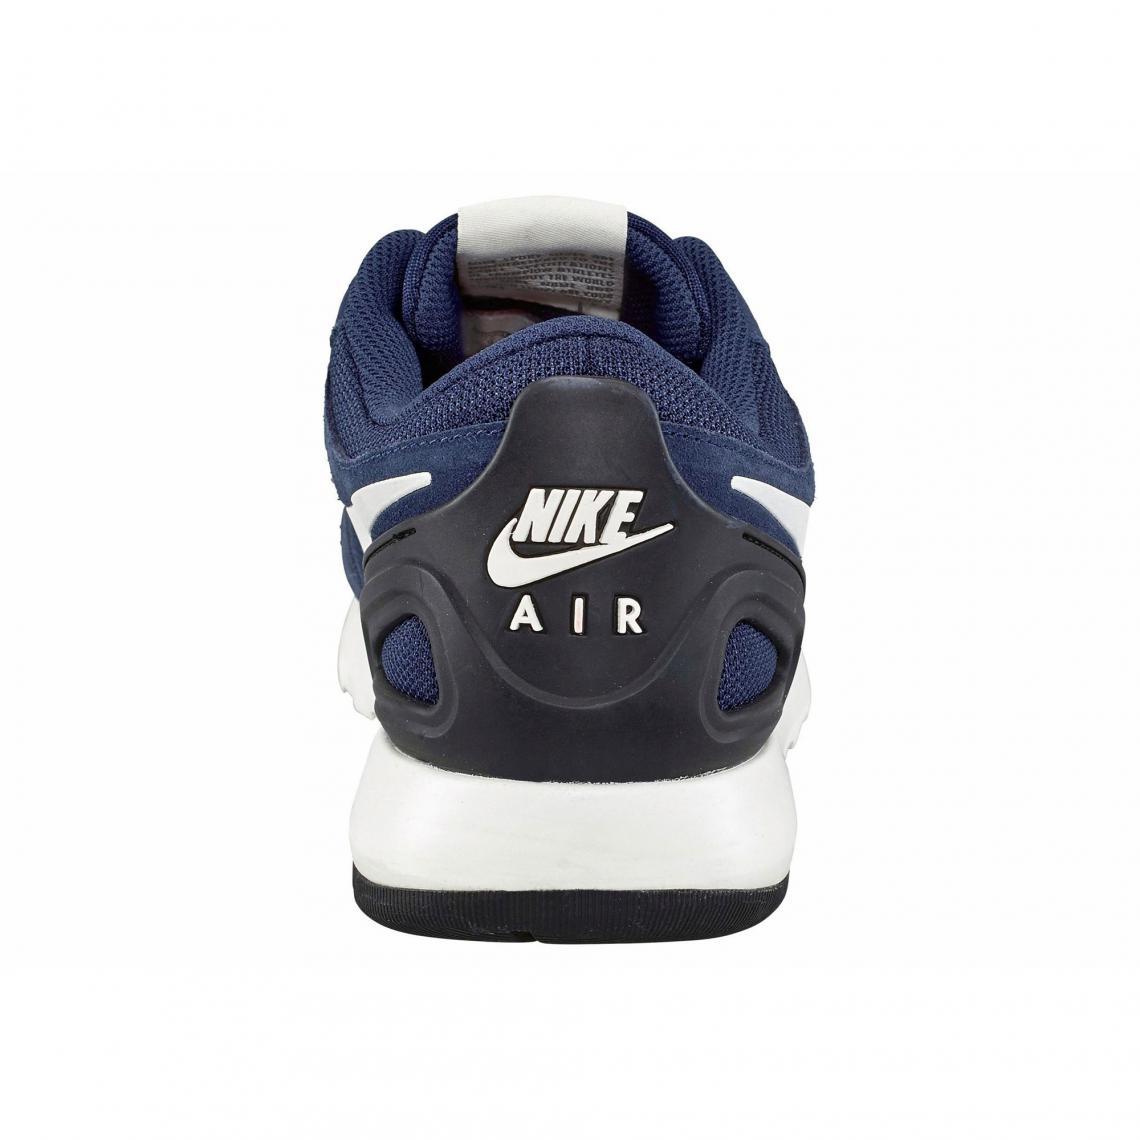 3suisses Chaussures Bleu Running Gris Nike Vibenna Air De Homme wxHnwqOZf